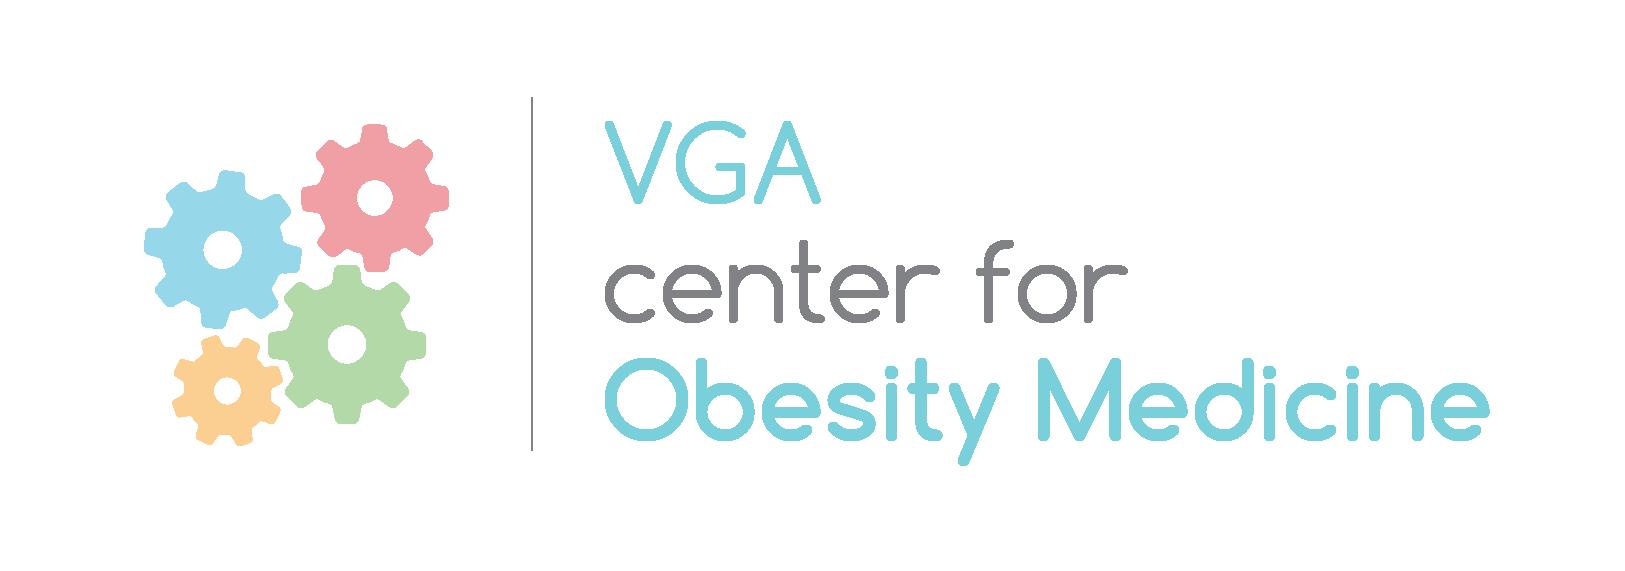 """VGA CENTER FOR OBESITY MEDICINE"""